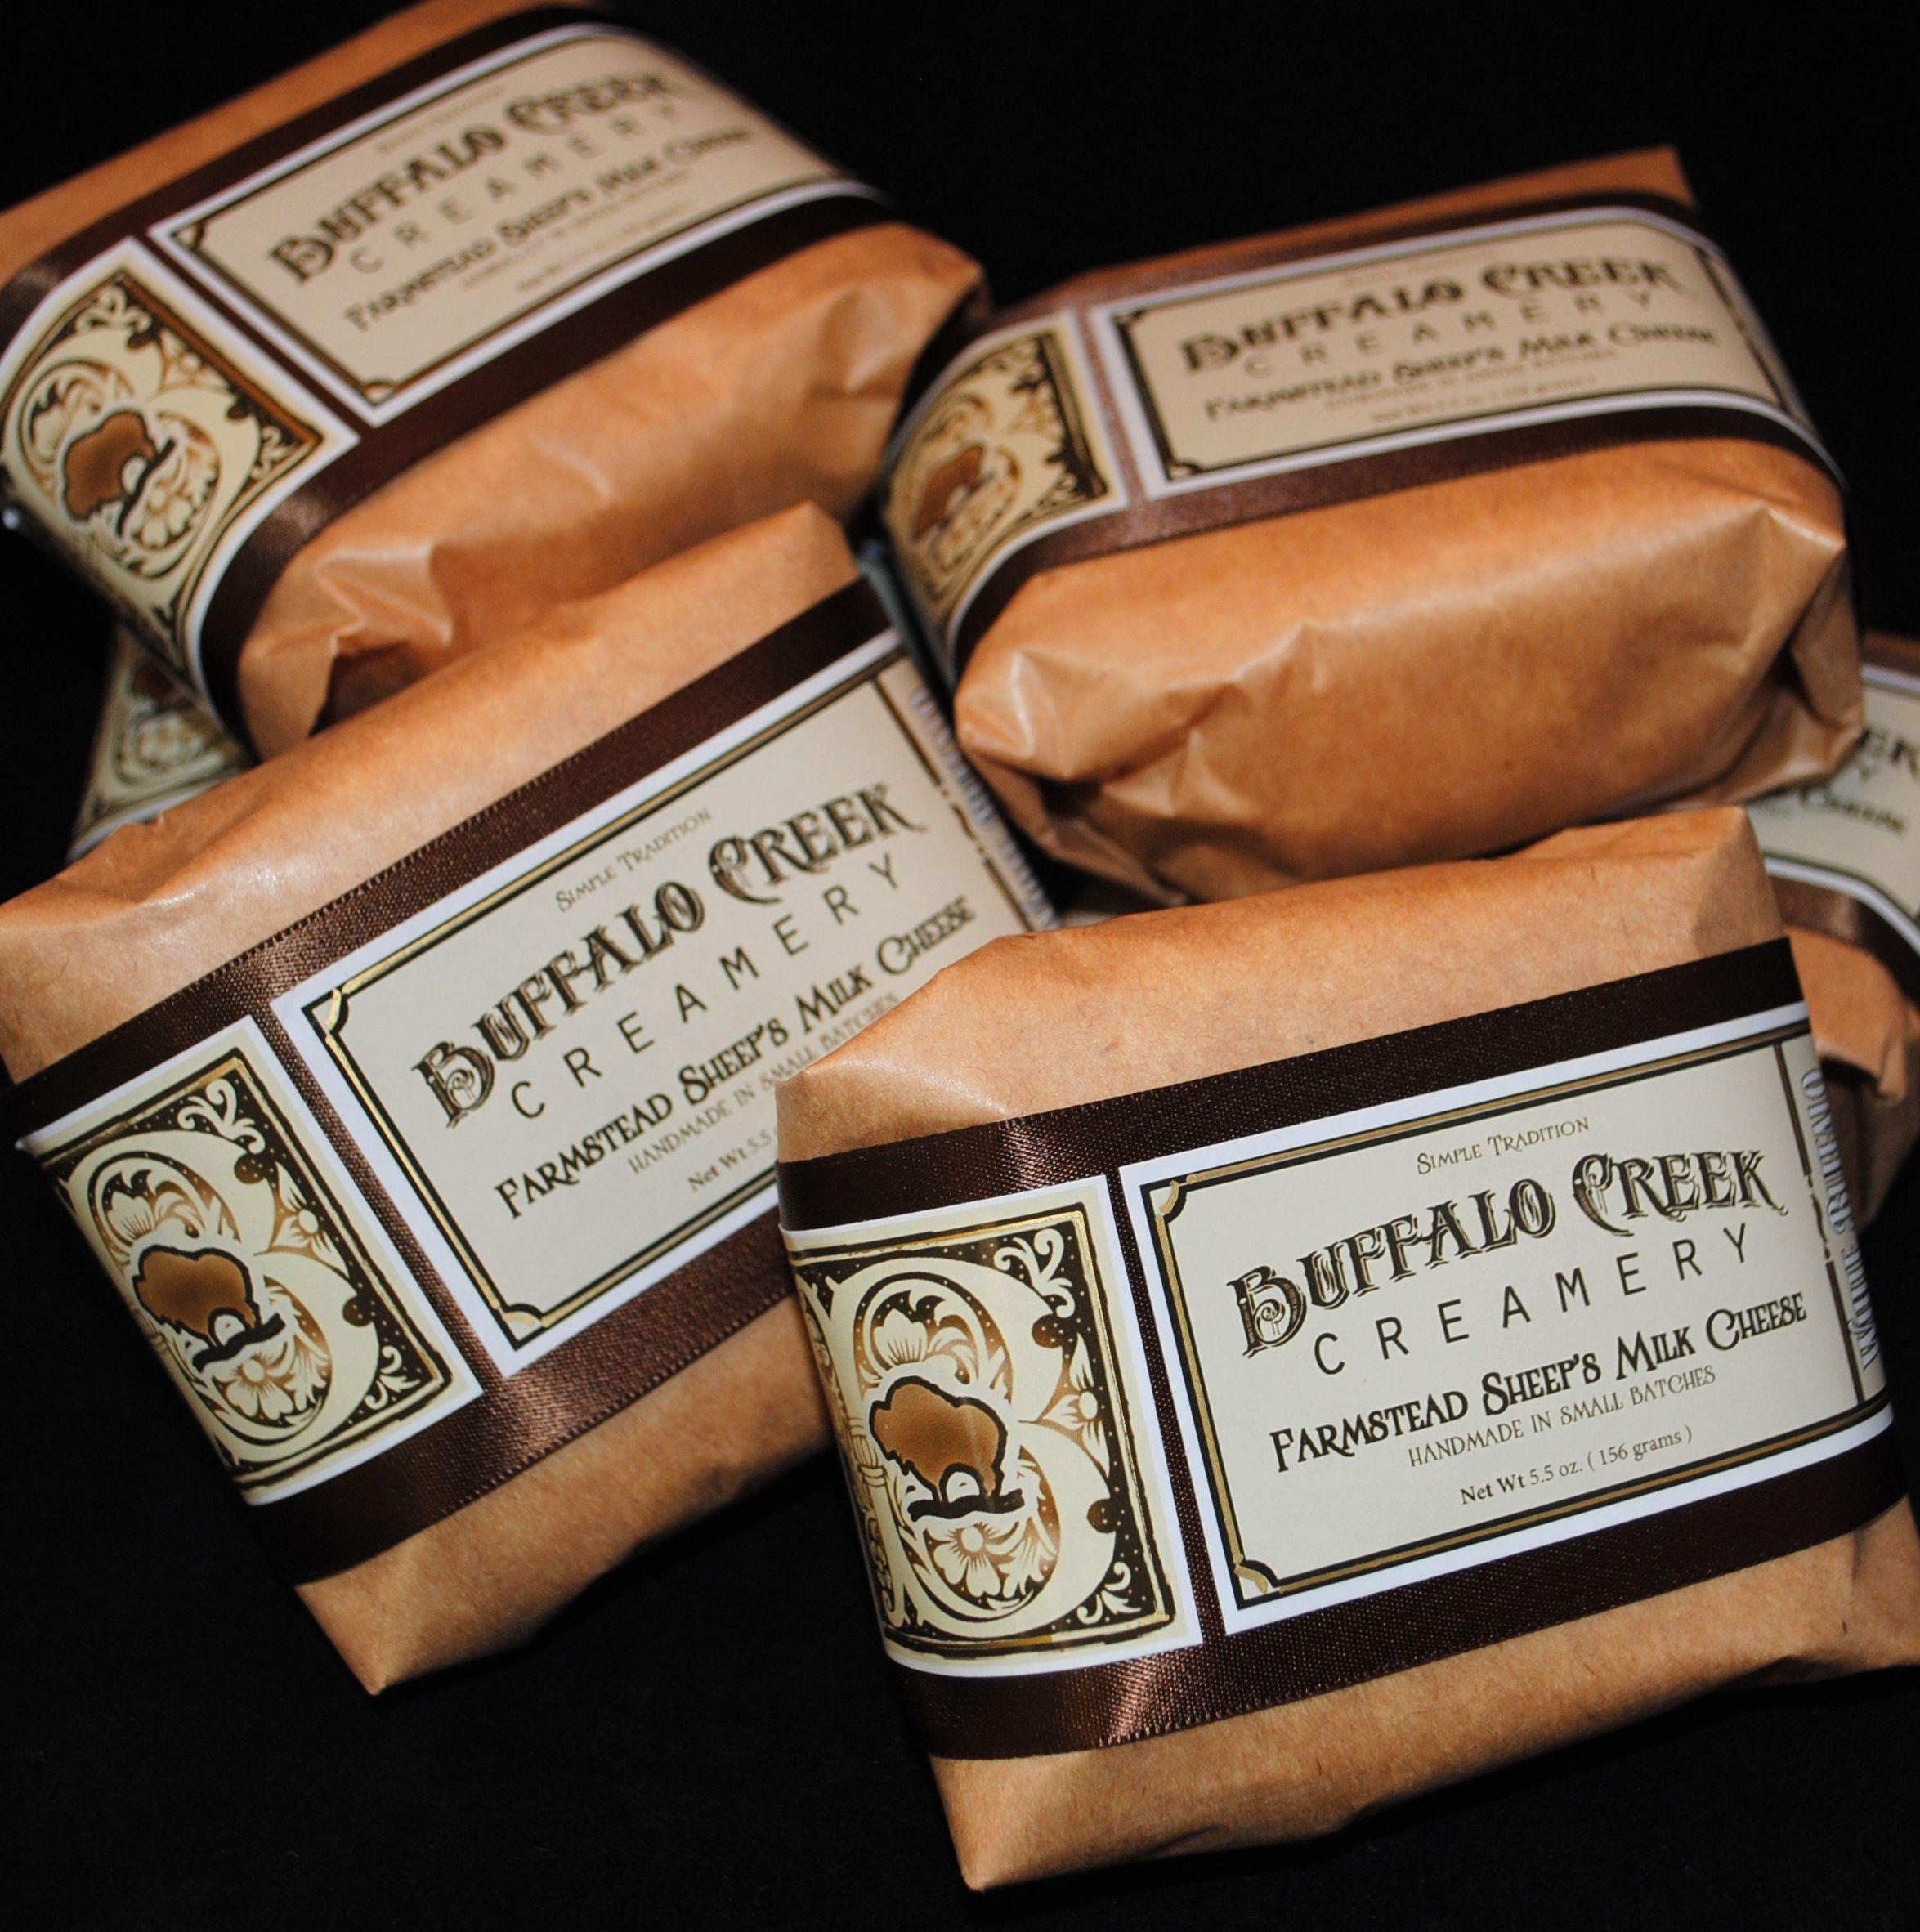 FARMSTEAD SHEEP'S MILK CHEESE from Buffalo Creek Creamery